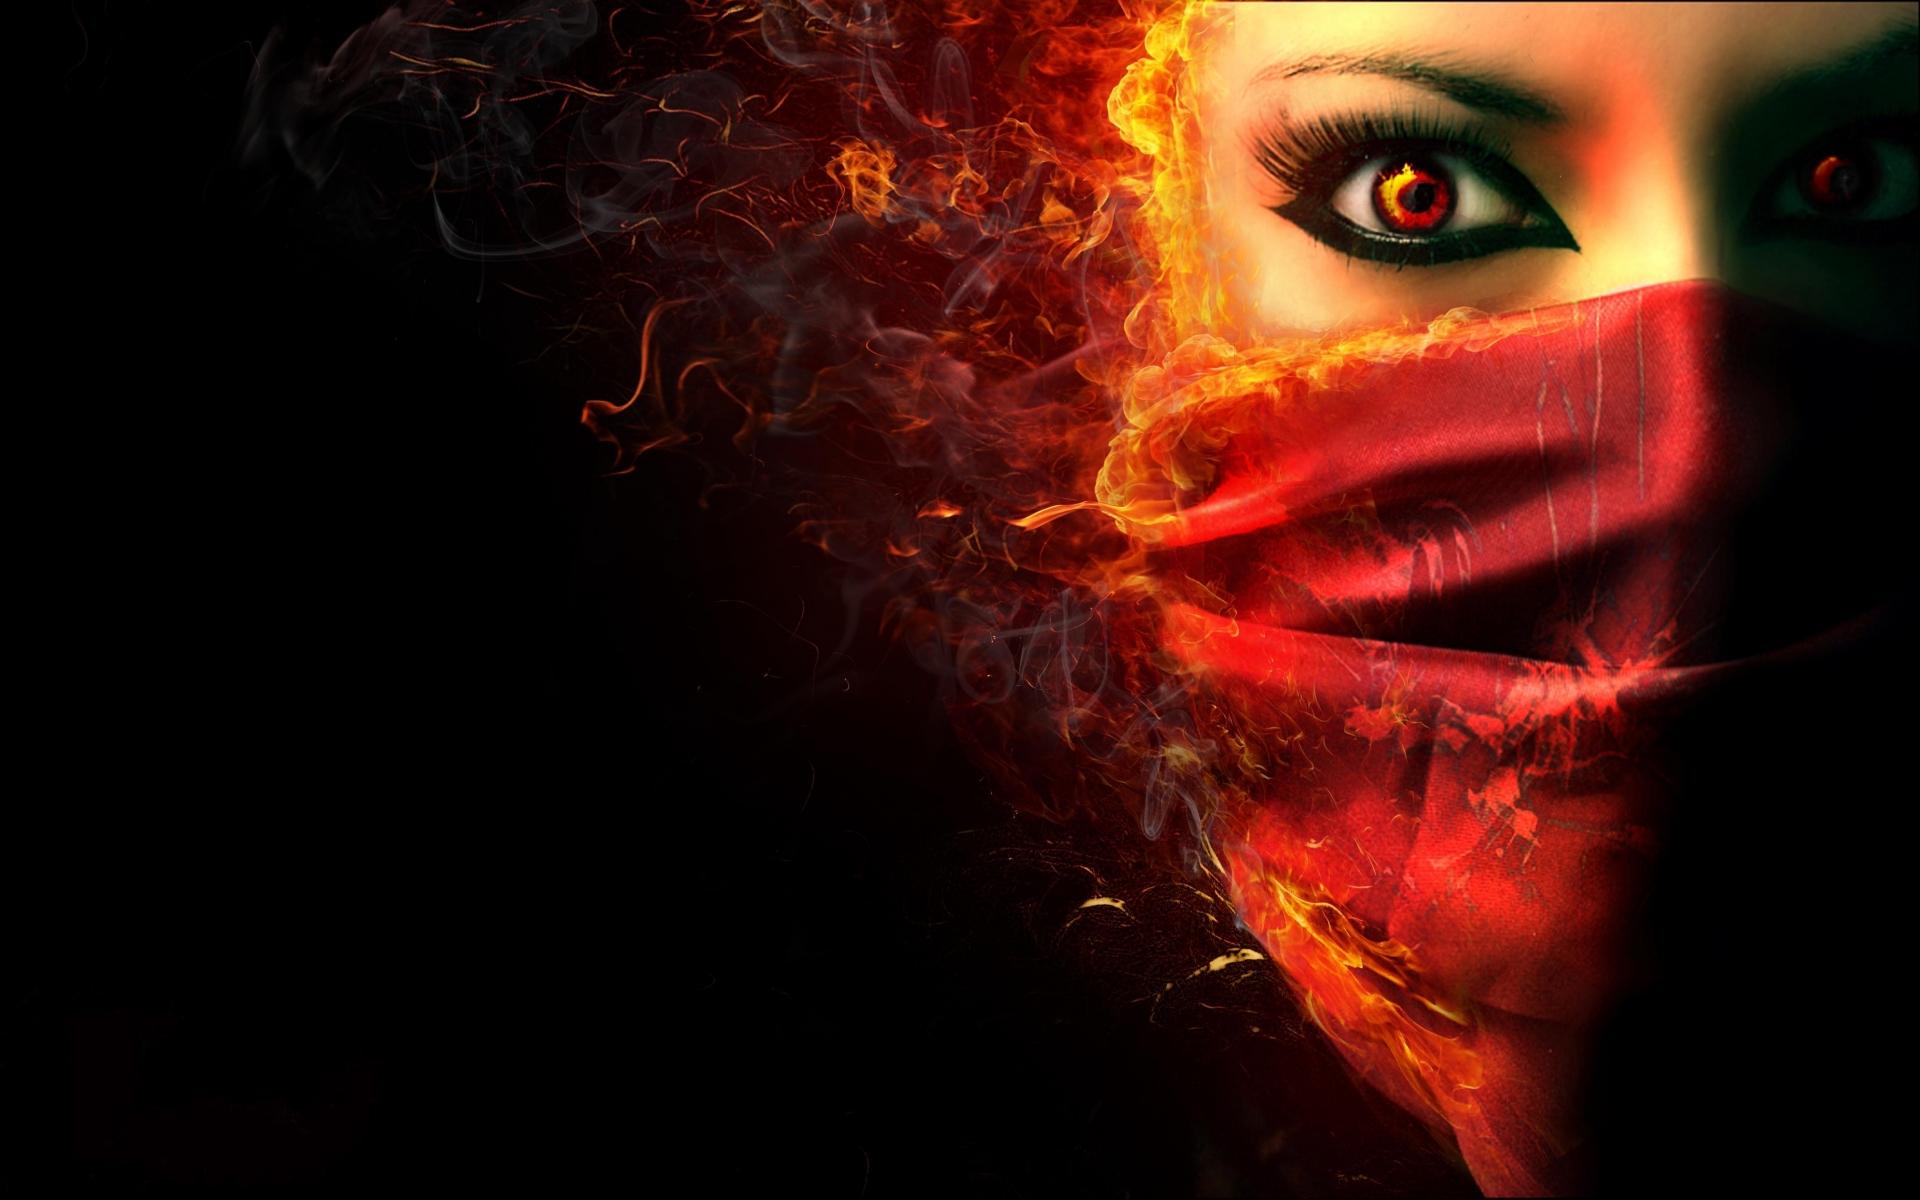 Hd wallpaper evil - Fantasy Dark Horror Face Demon Evil Women Wallpaper 1920x1200